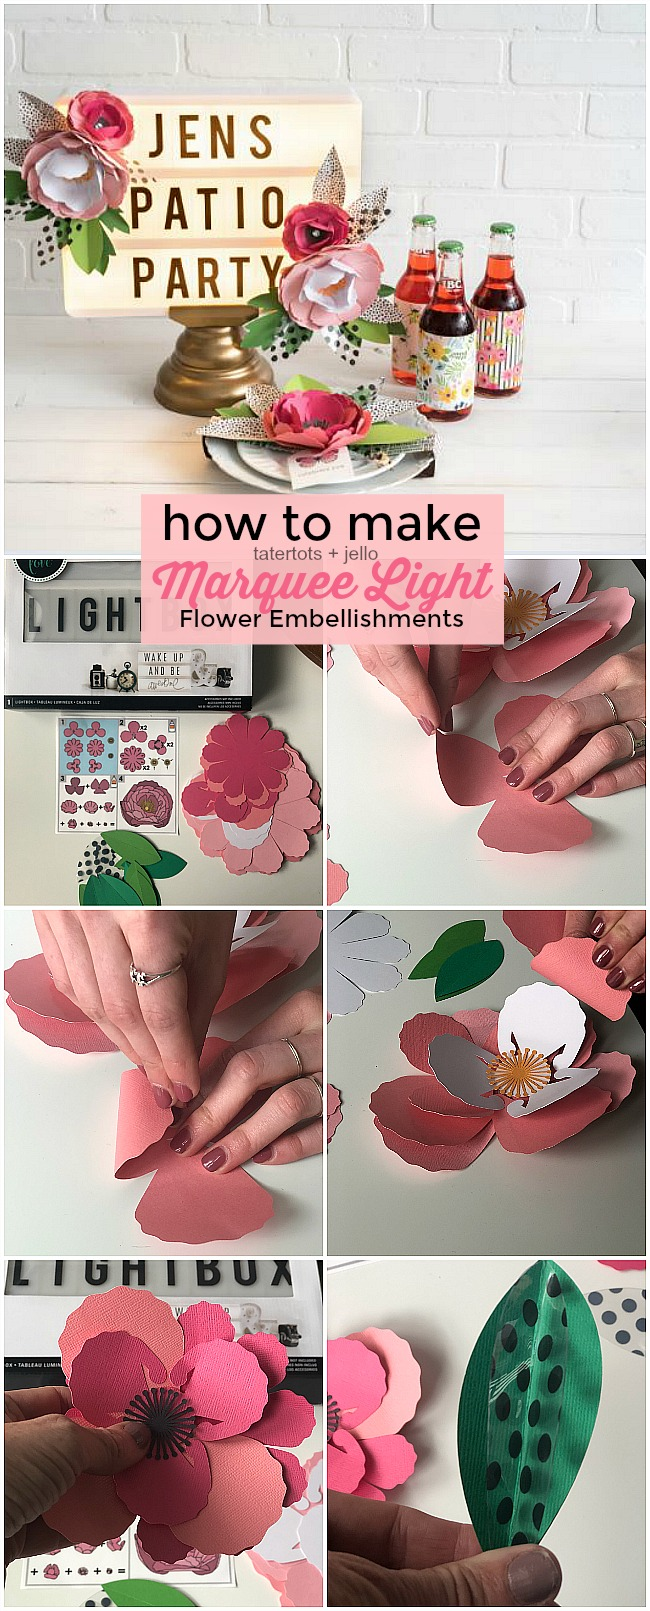 DIY Marquee Lightbox Flower Embellishments!